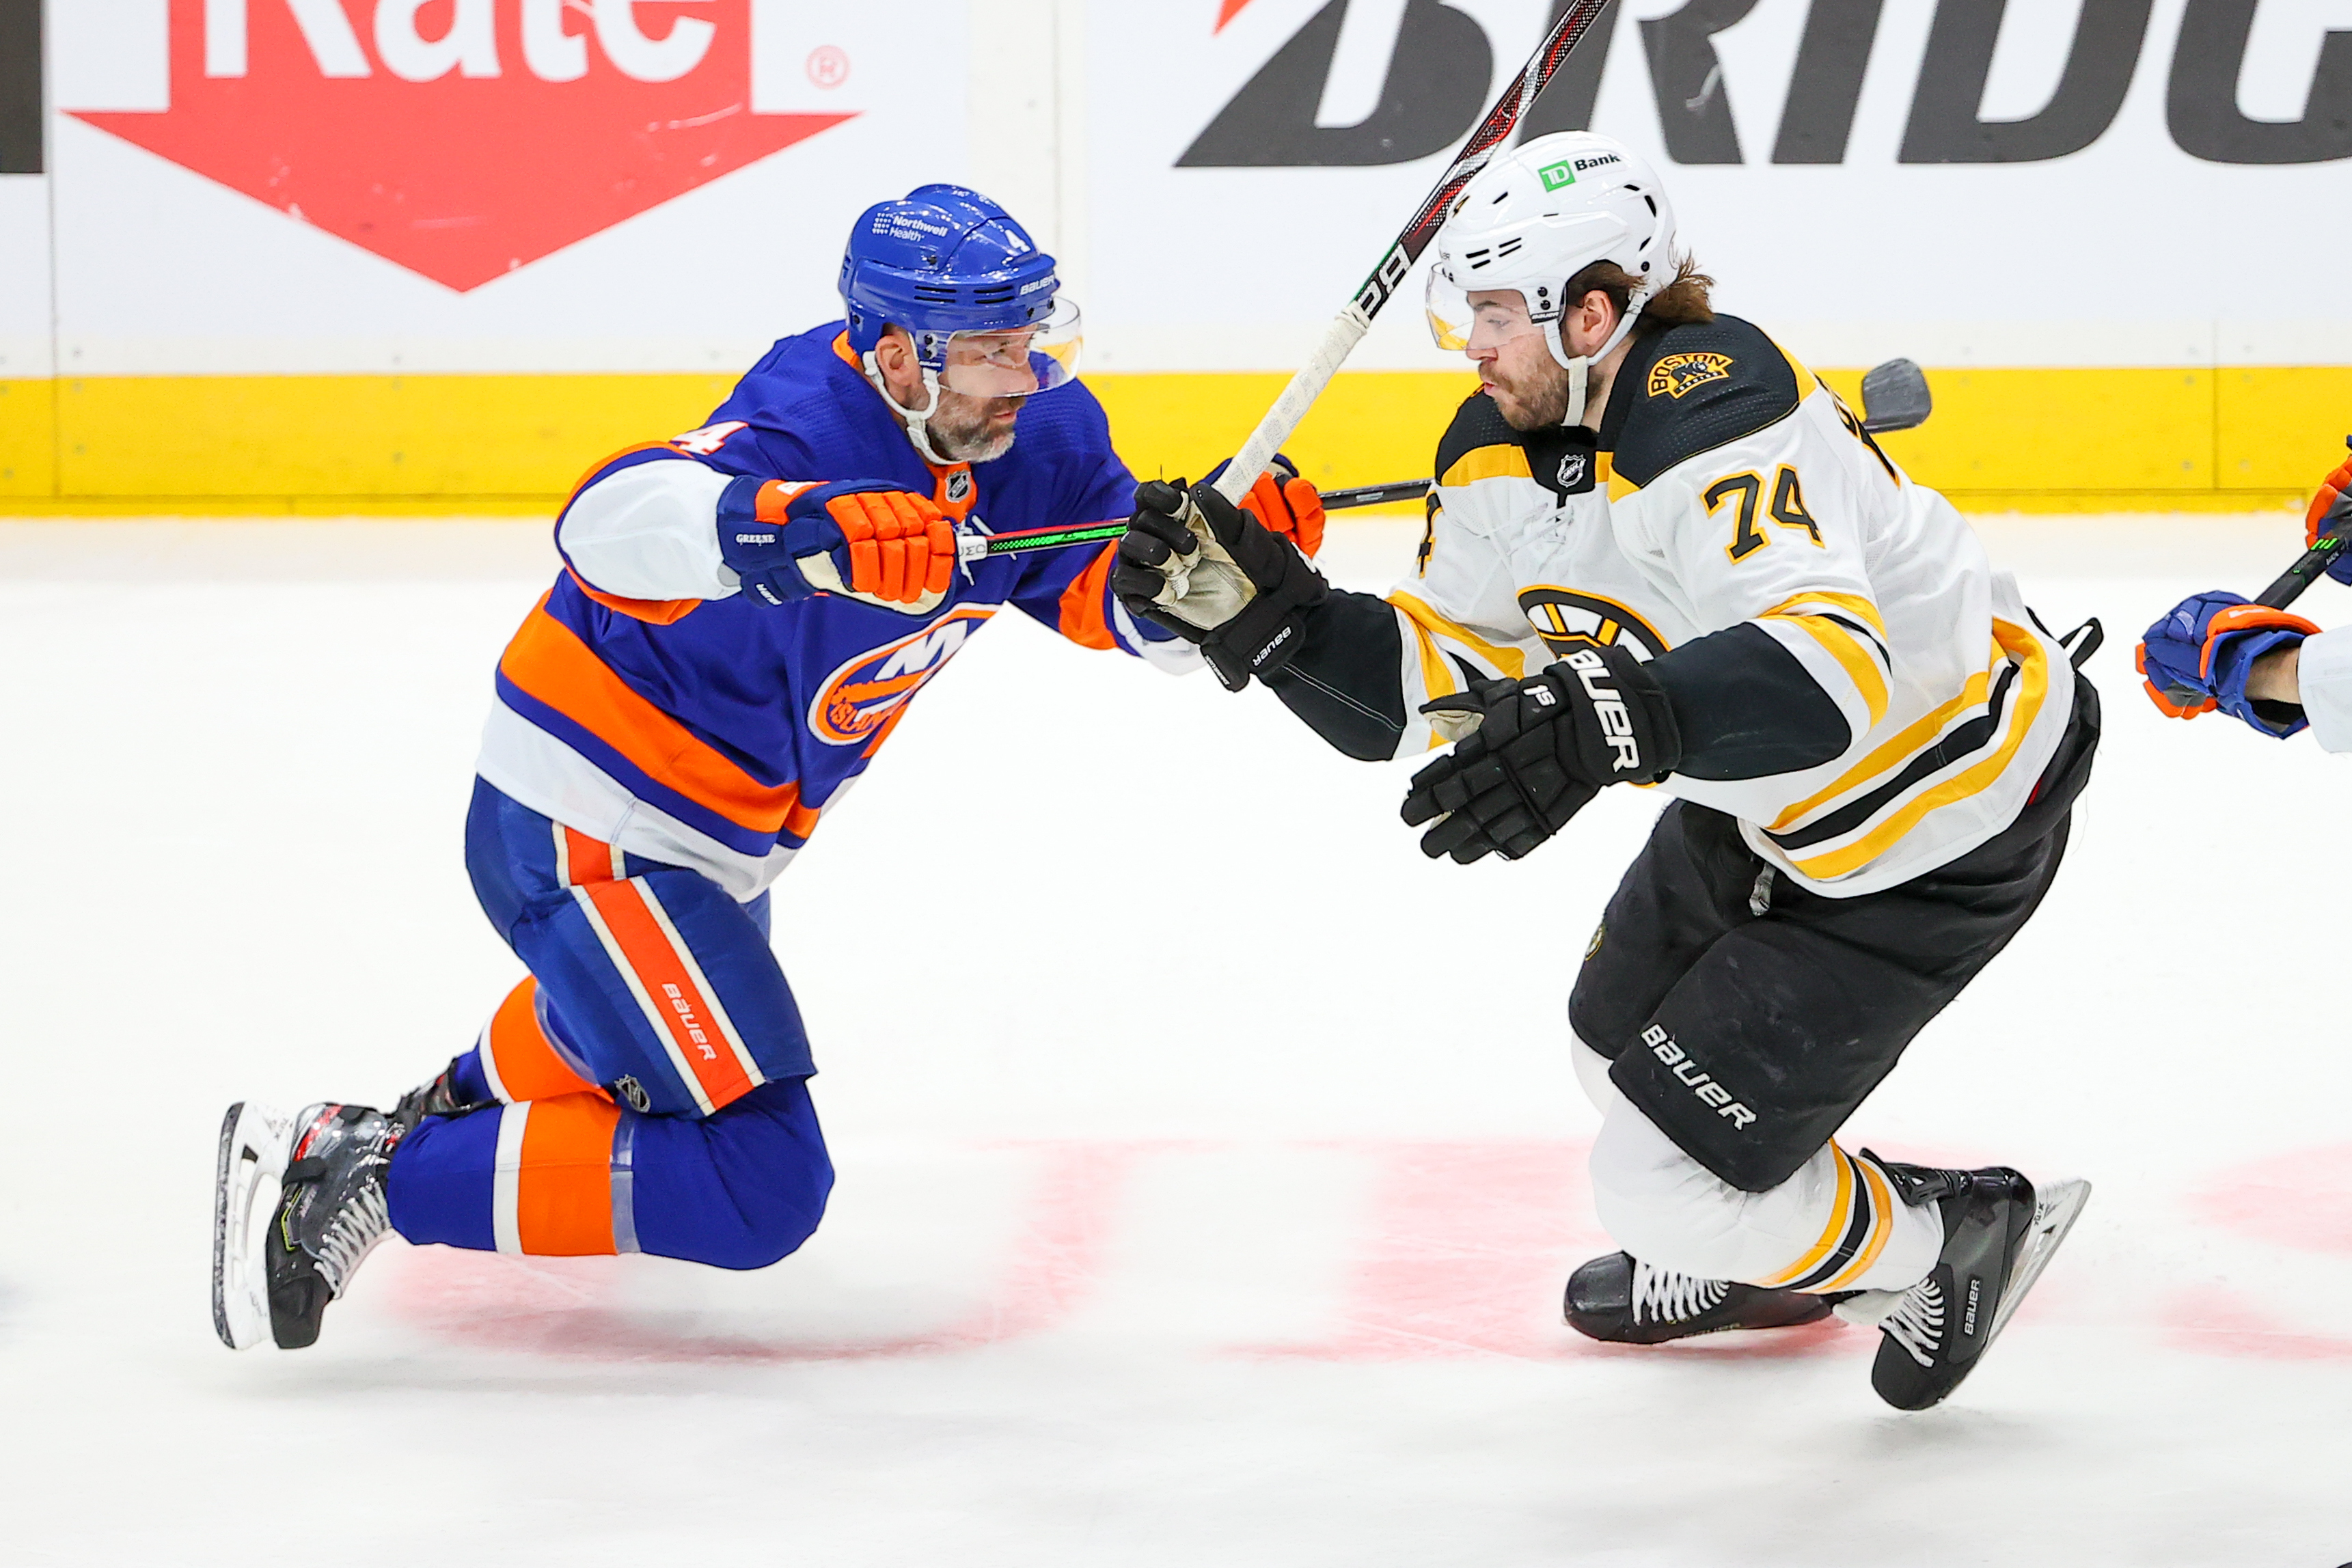 NHL: JUN 05 Stanley Cup Playoffs Second Round - Bruins at Islanders